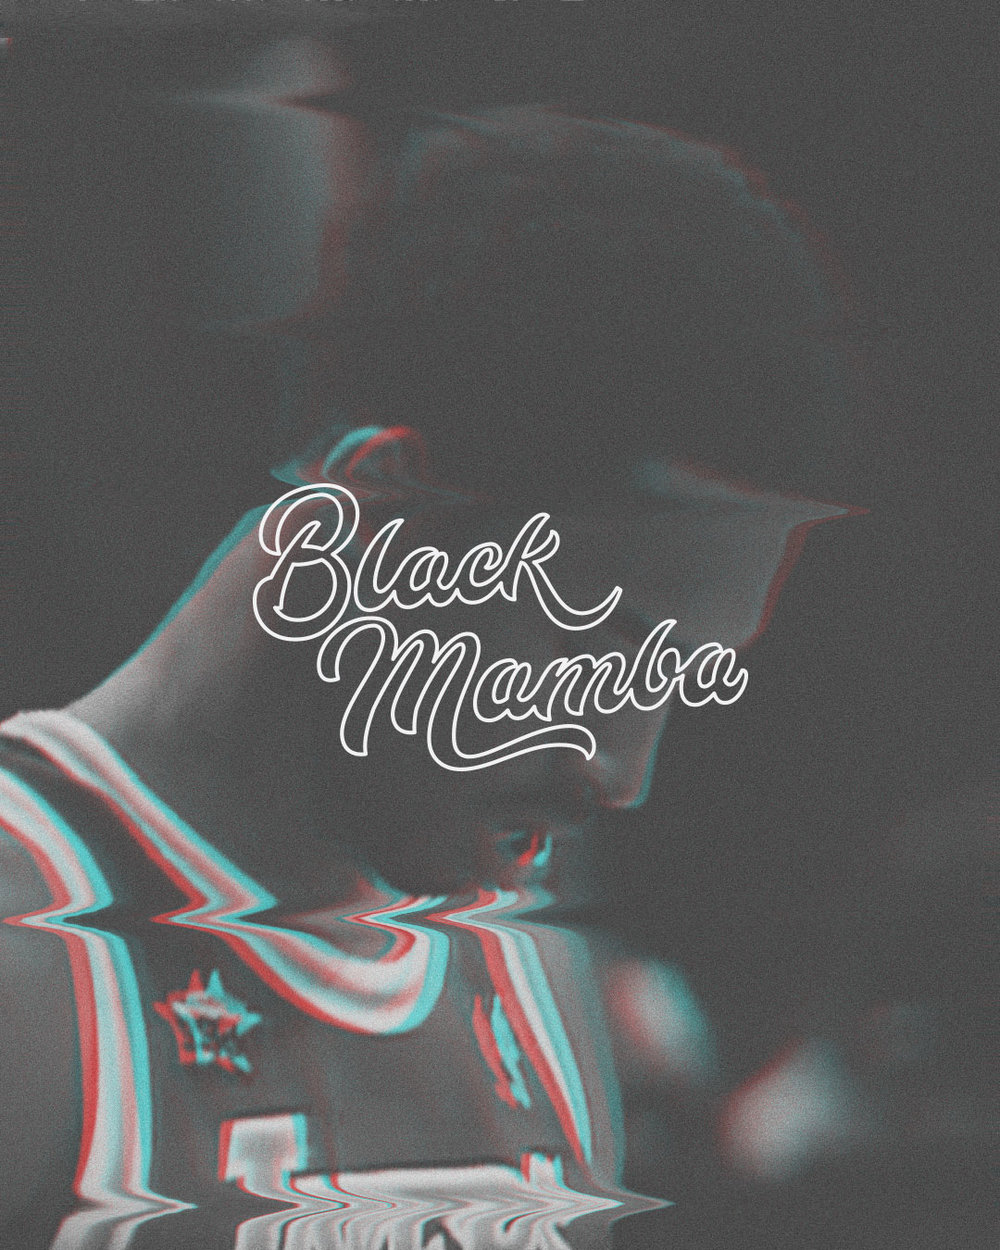 BlackMamba1.jpg